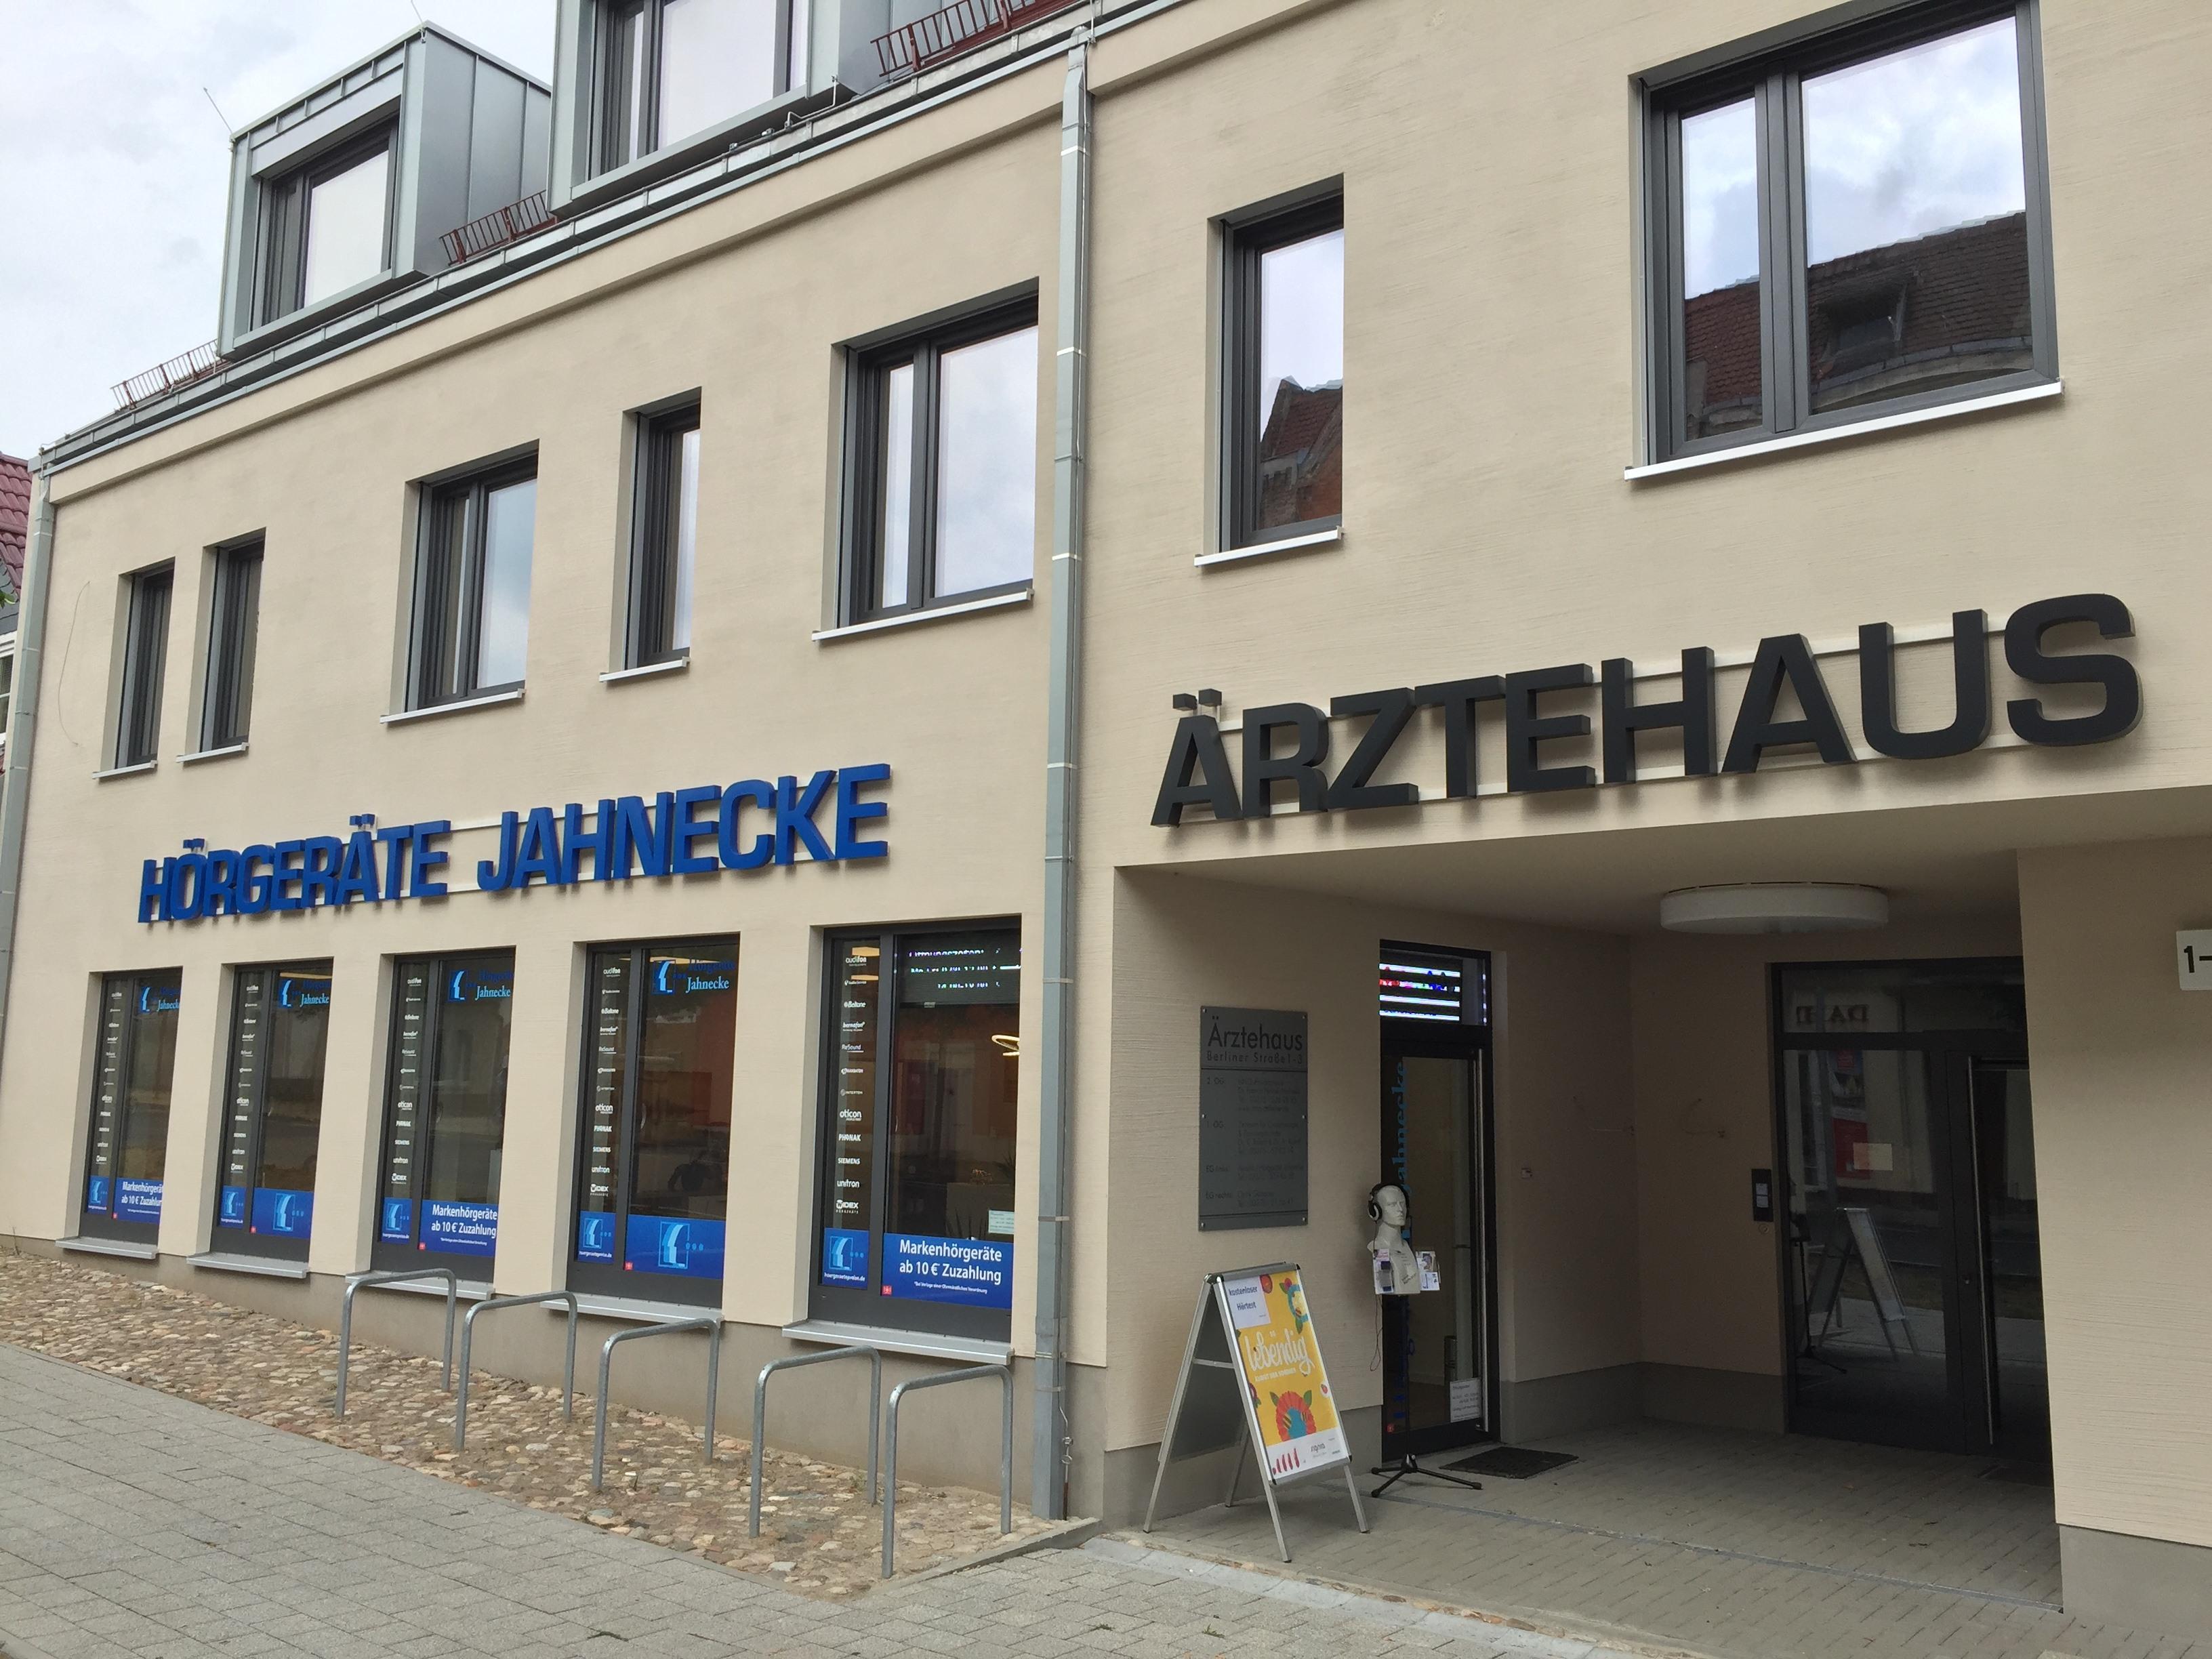 Hörgeräte Jahnecke Königs Wusterhausen